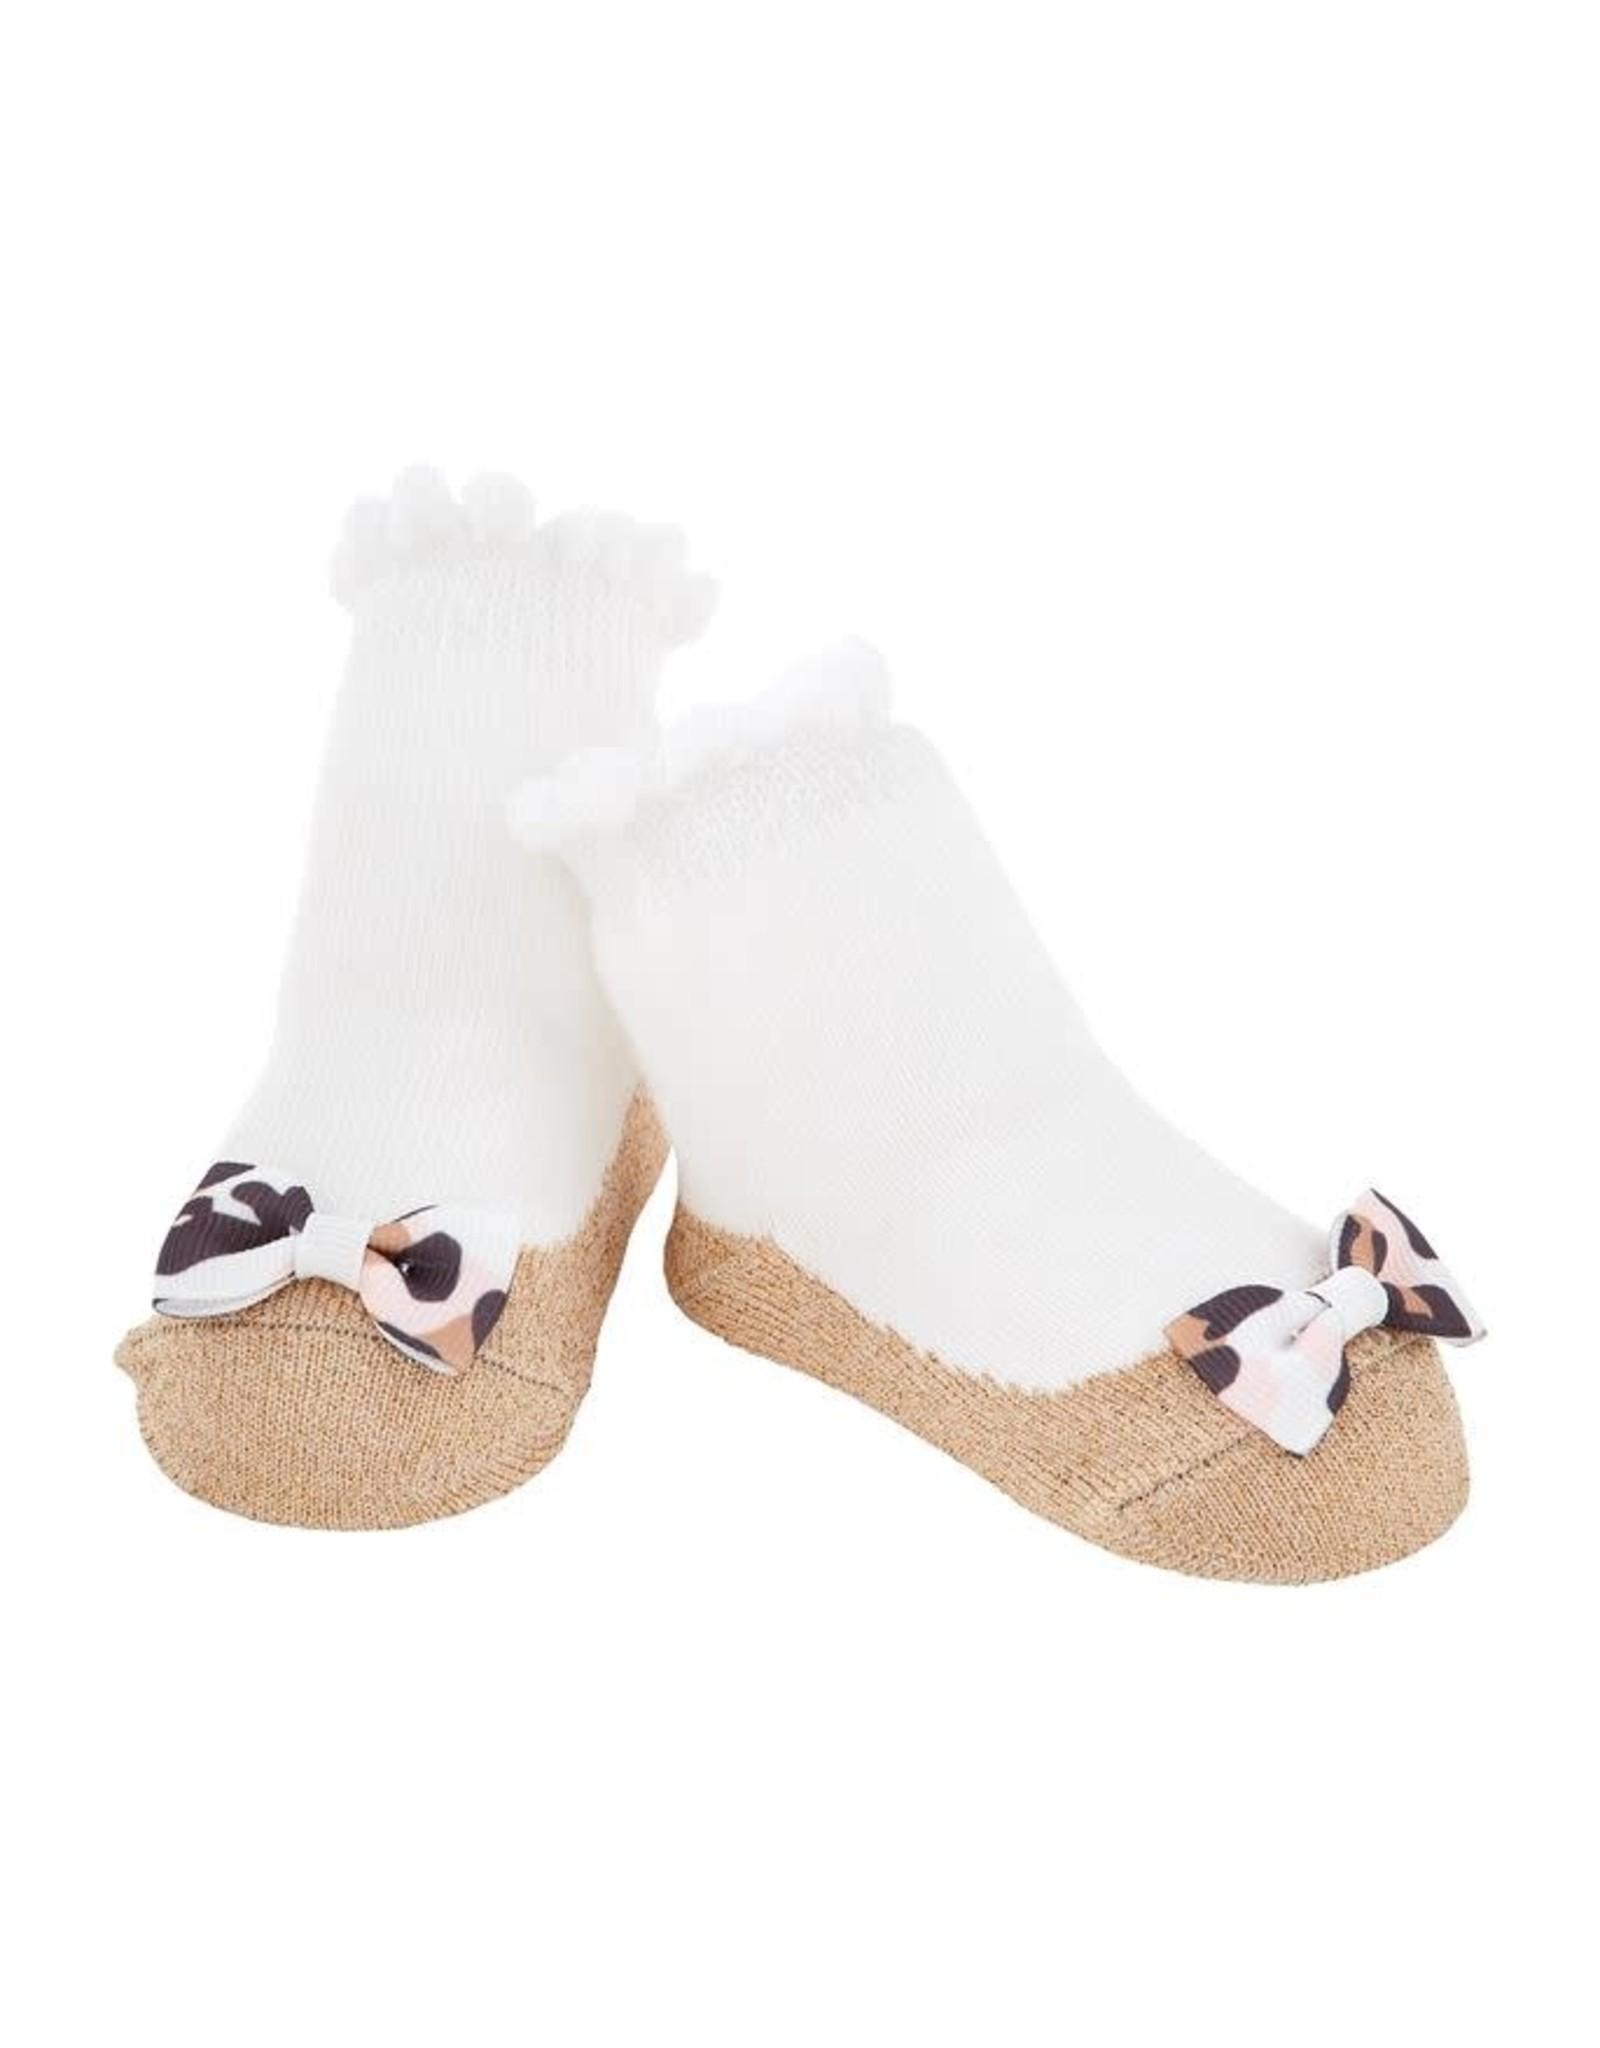 Mudpie Mud Pie - Gold Bow Socks